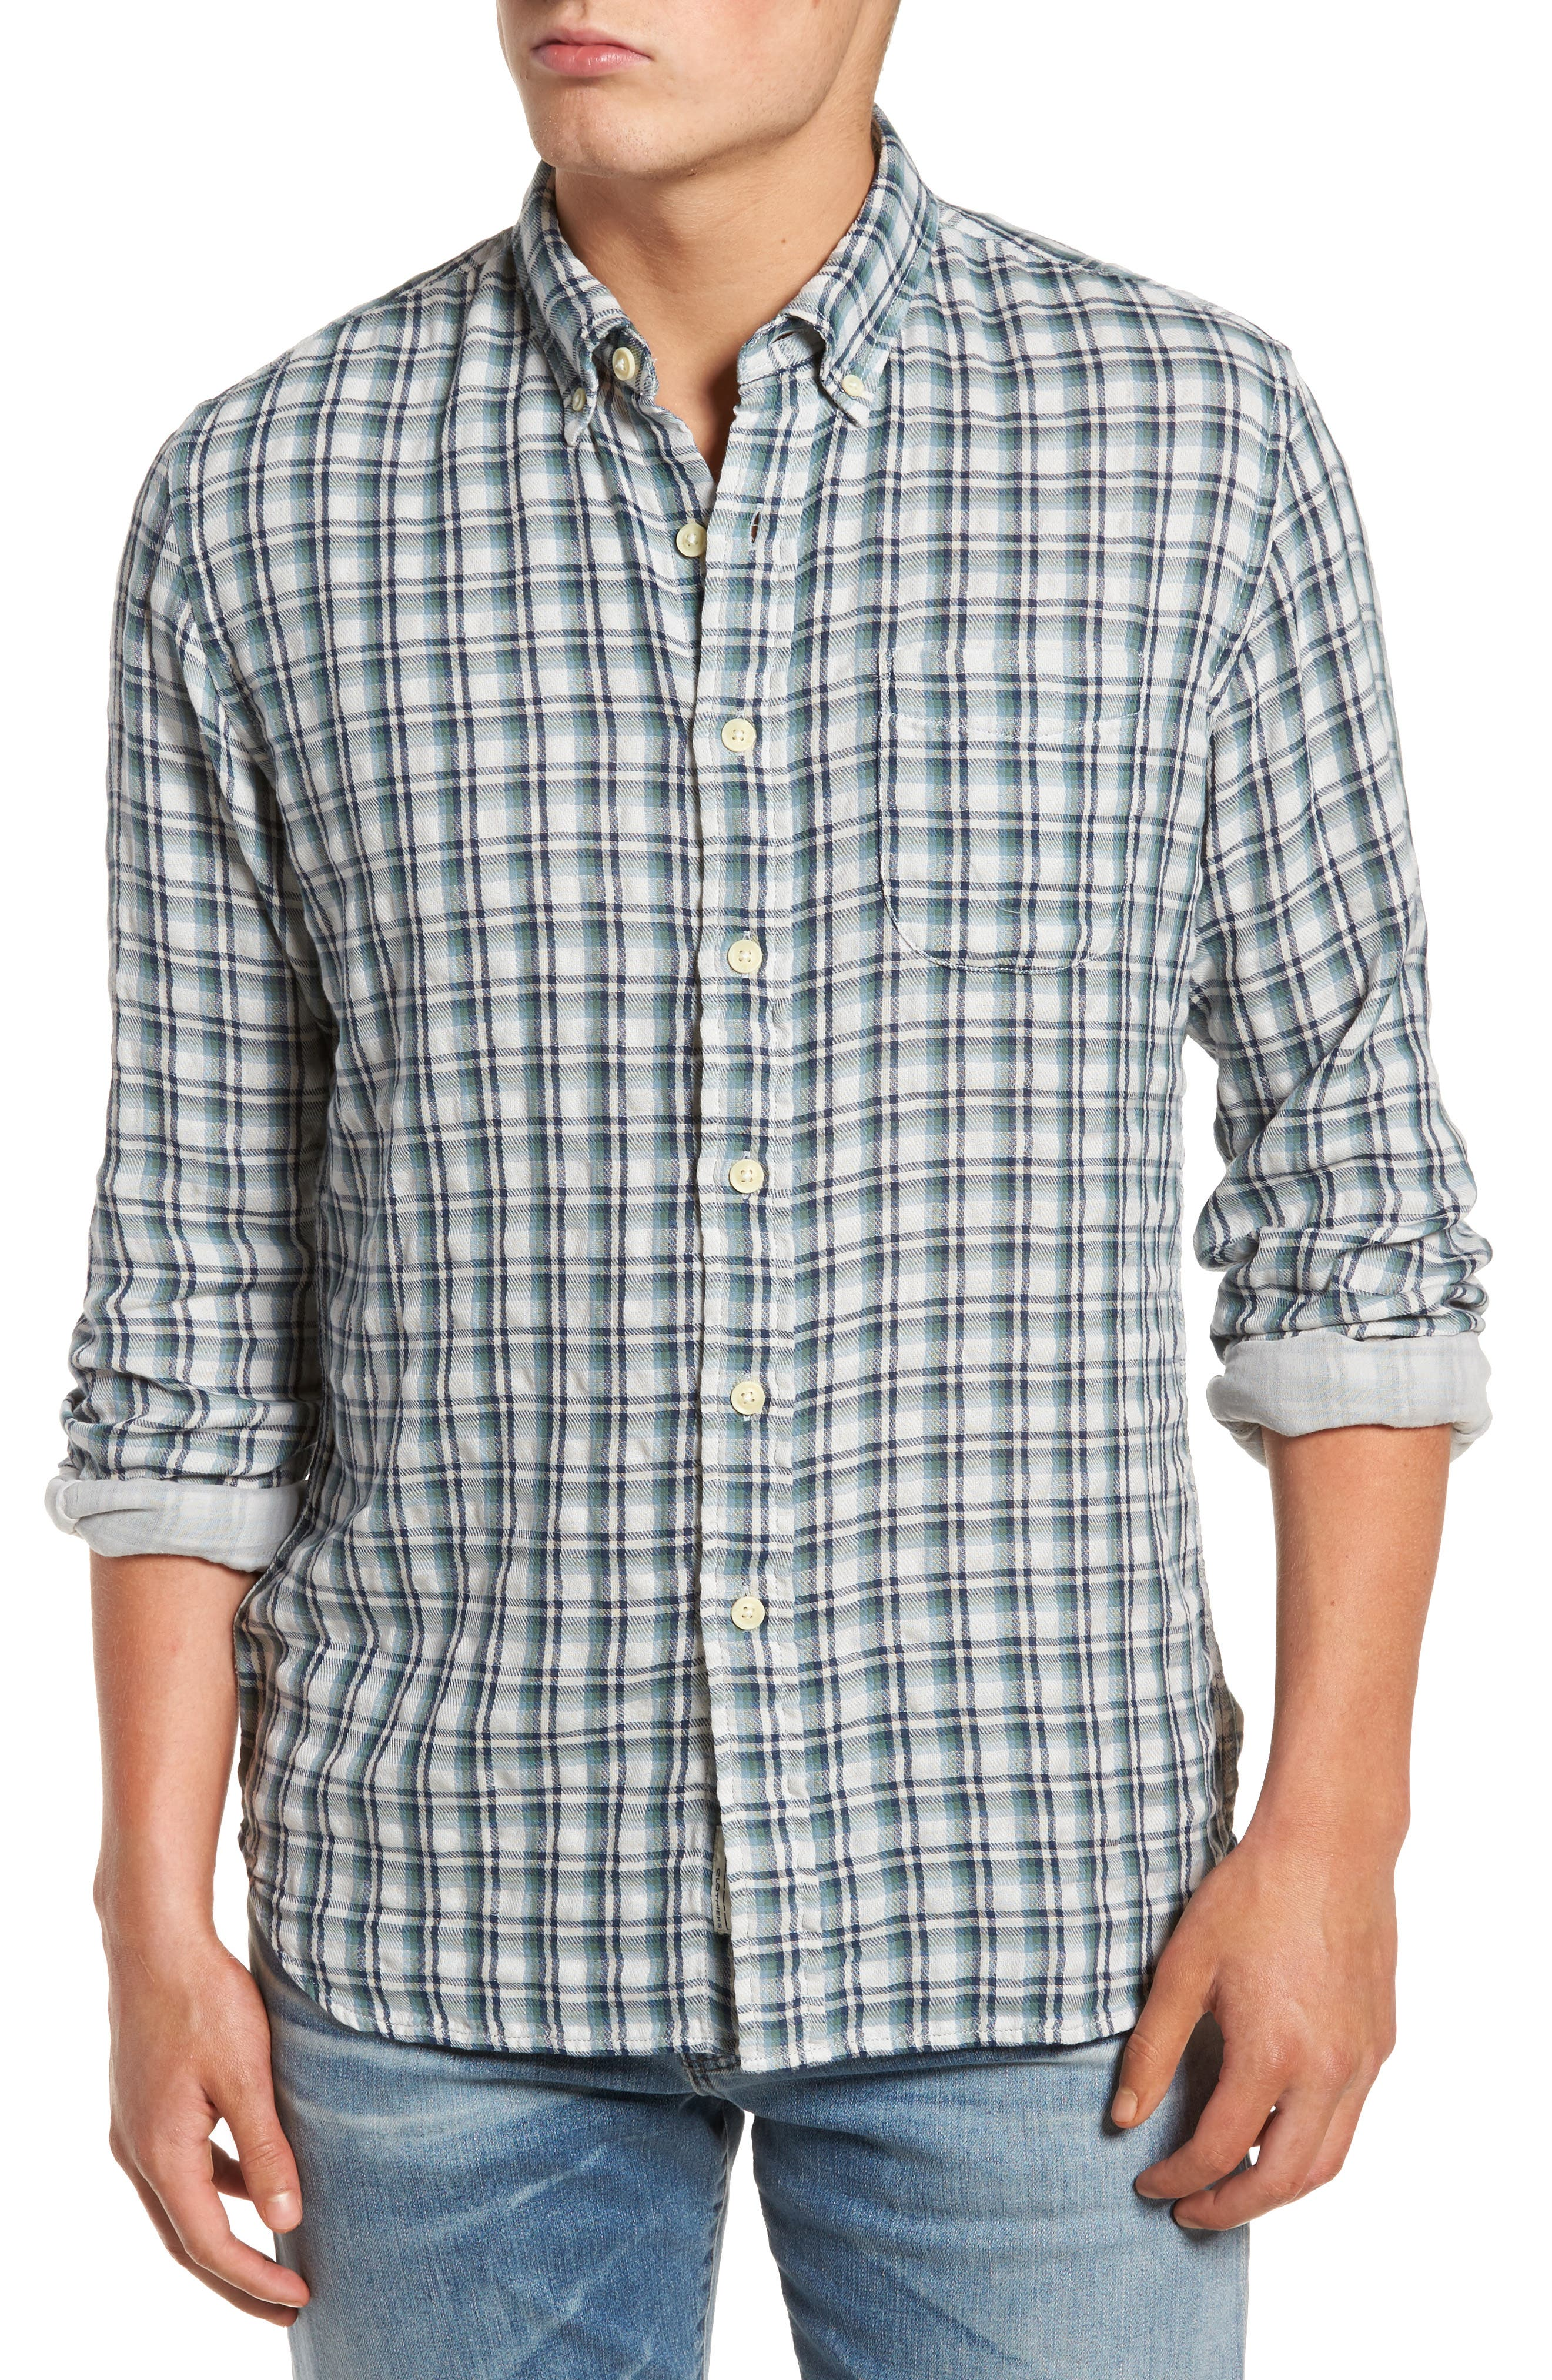 Boulder Double Cloth Plaid Sport Shirt,                             Main thumbnail 1, color,                             Cream Green Navy